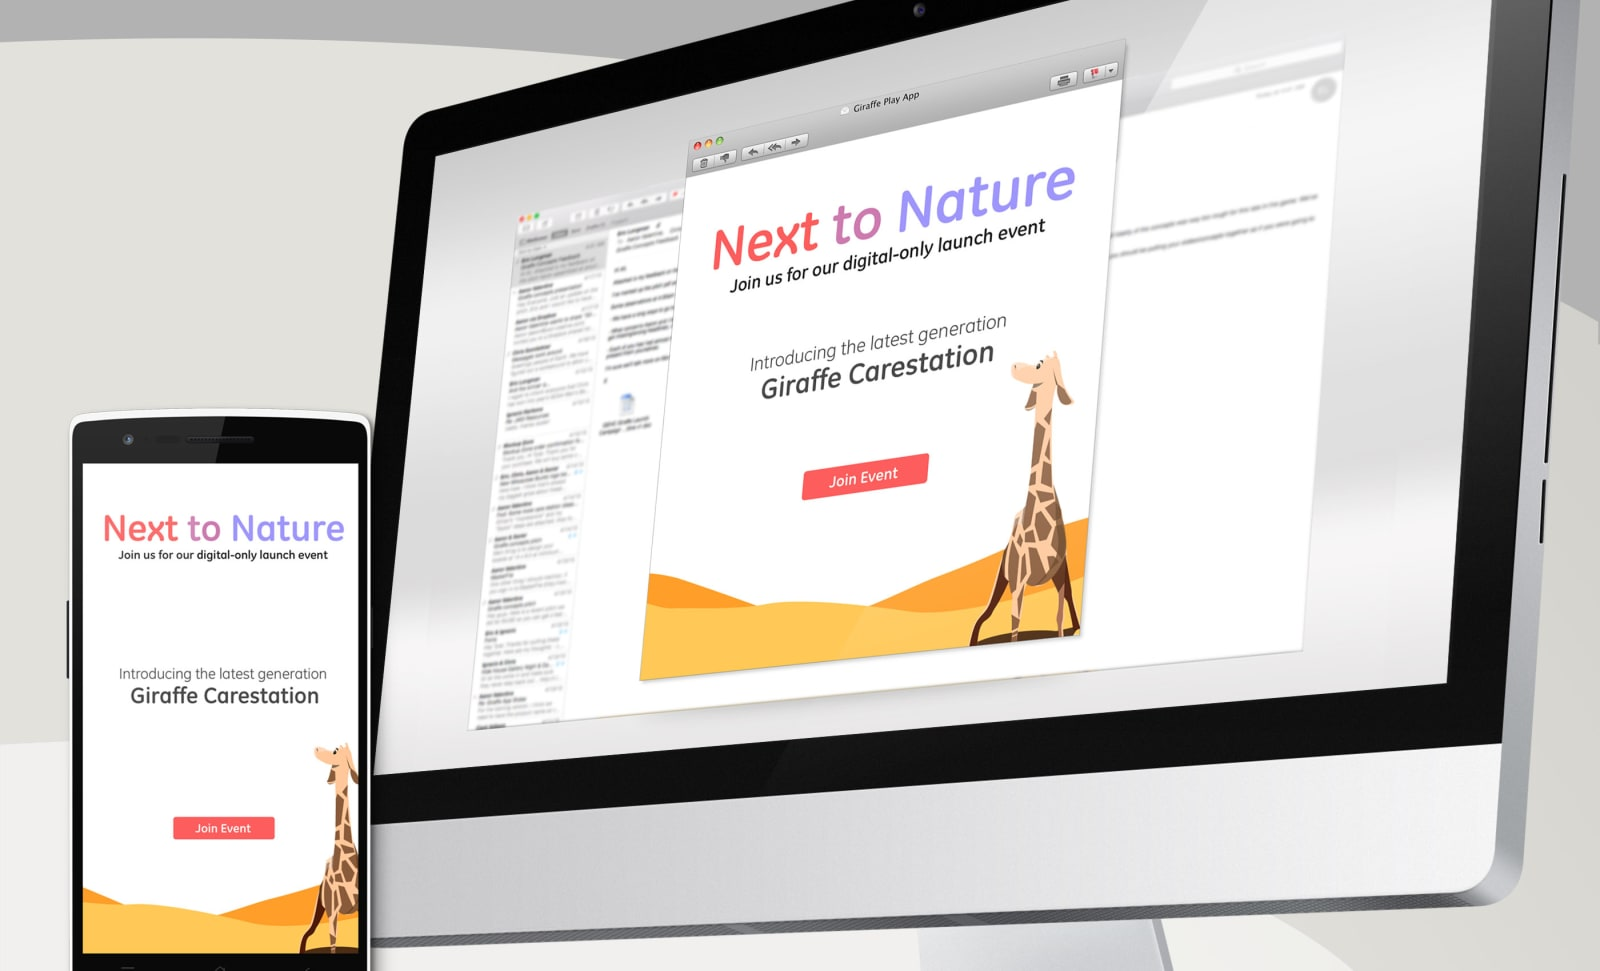 GE Giraffe Carestation Digital Invite